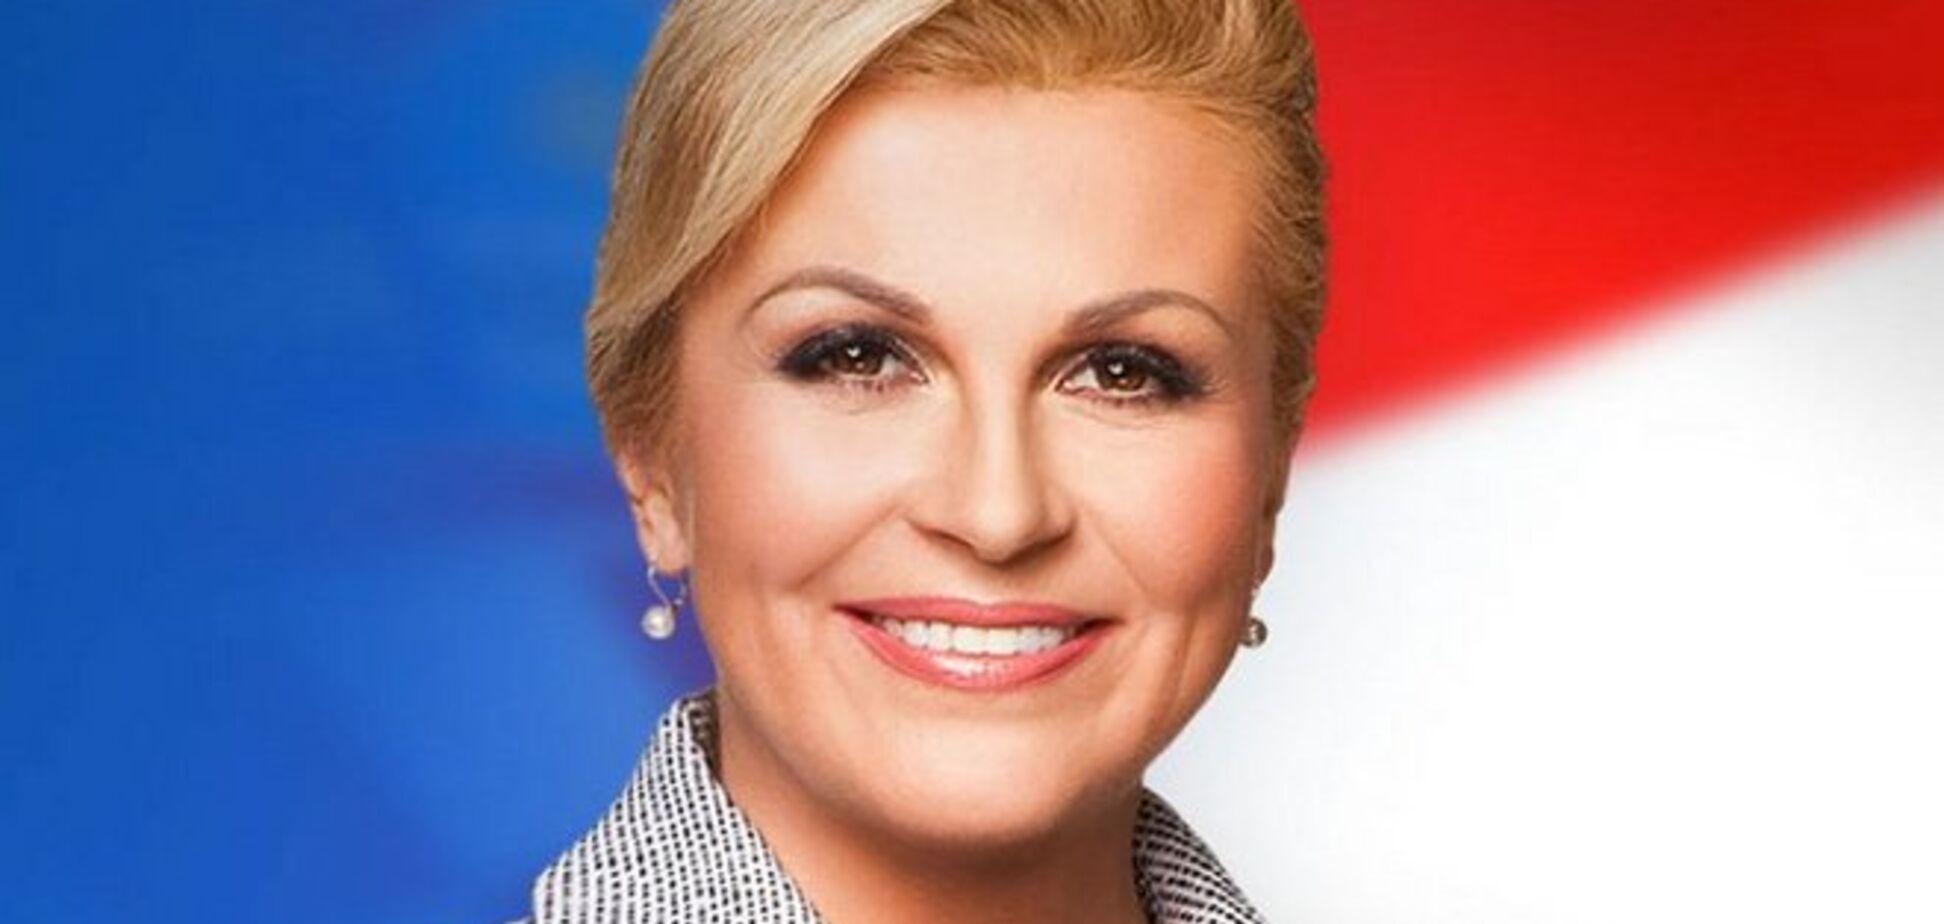 Президент Хорватии Колинда Грабар-Китарович: 'Фельдмаршал'